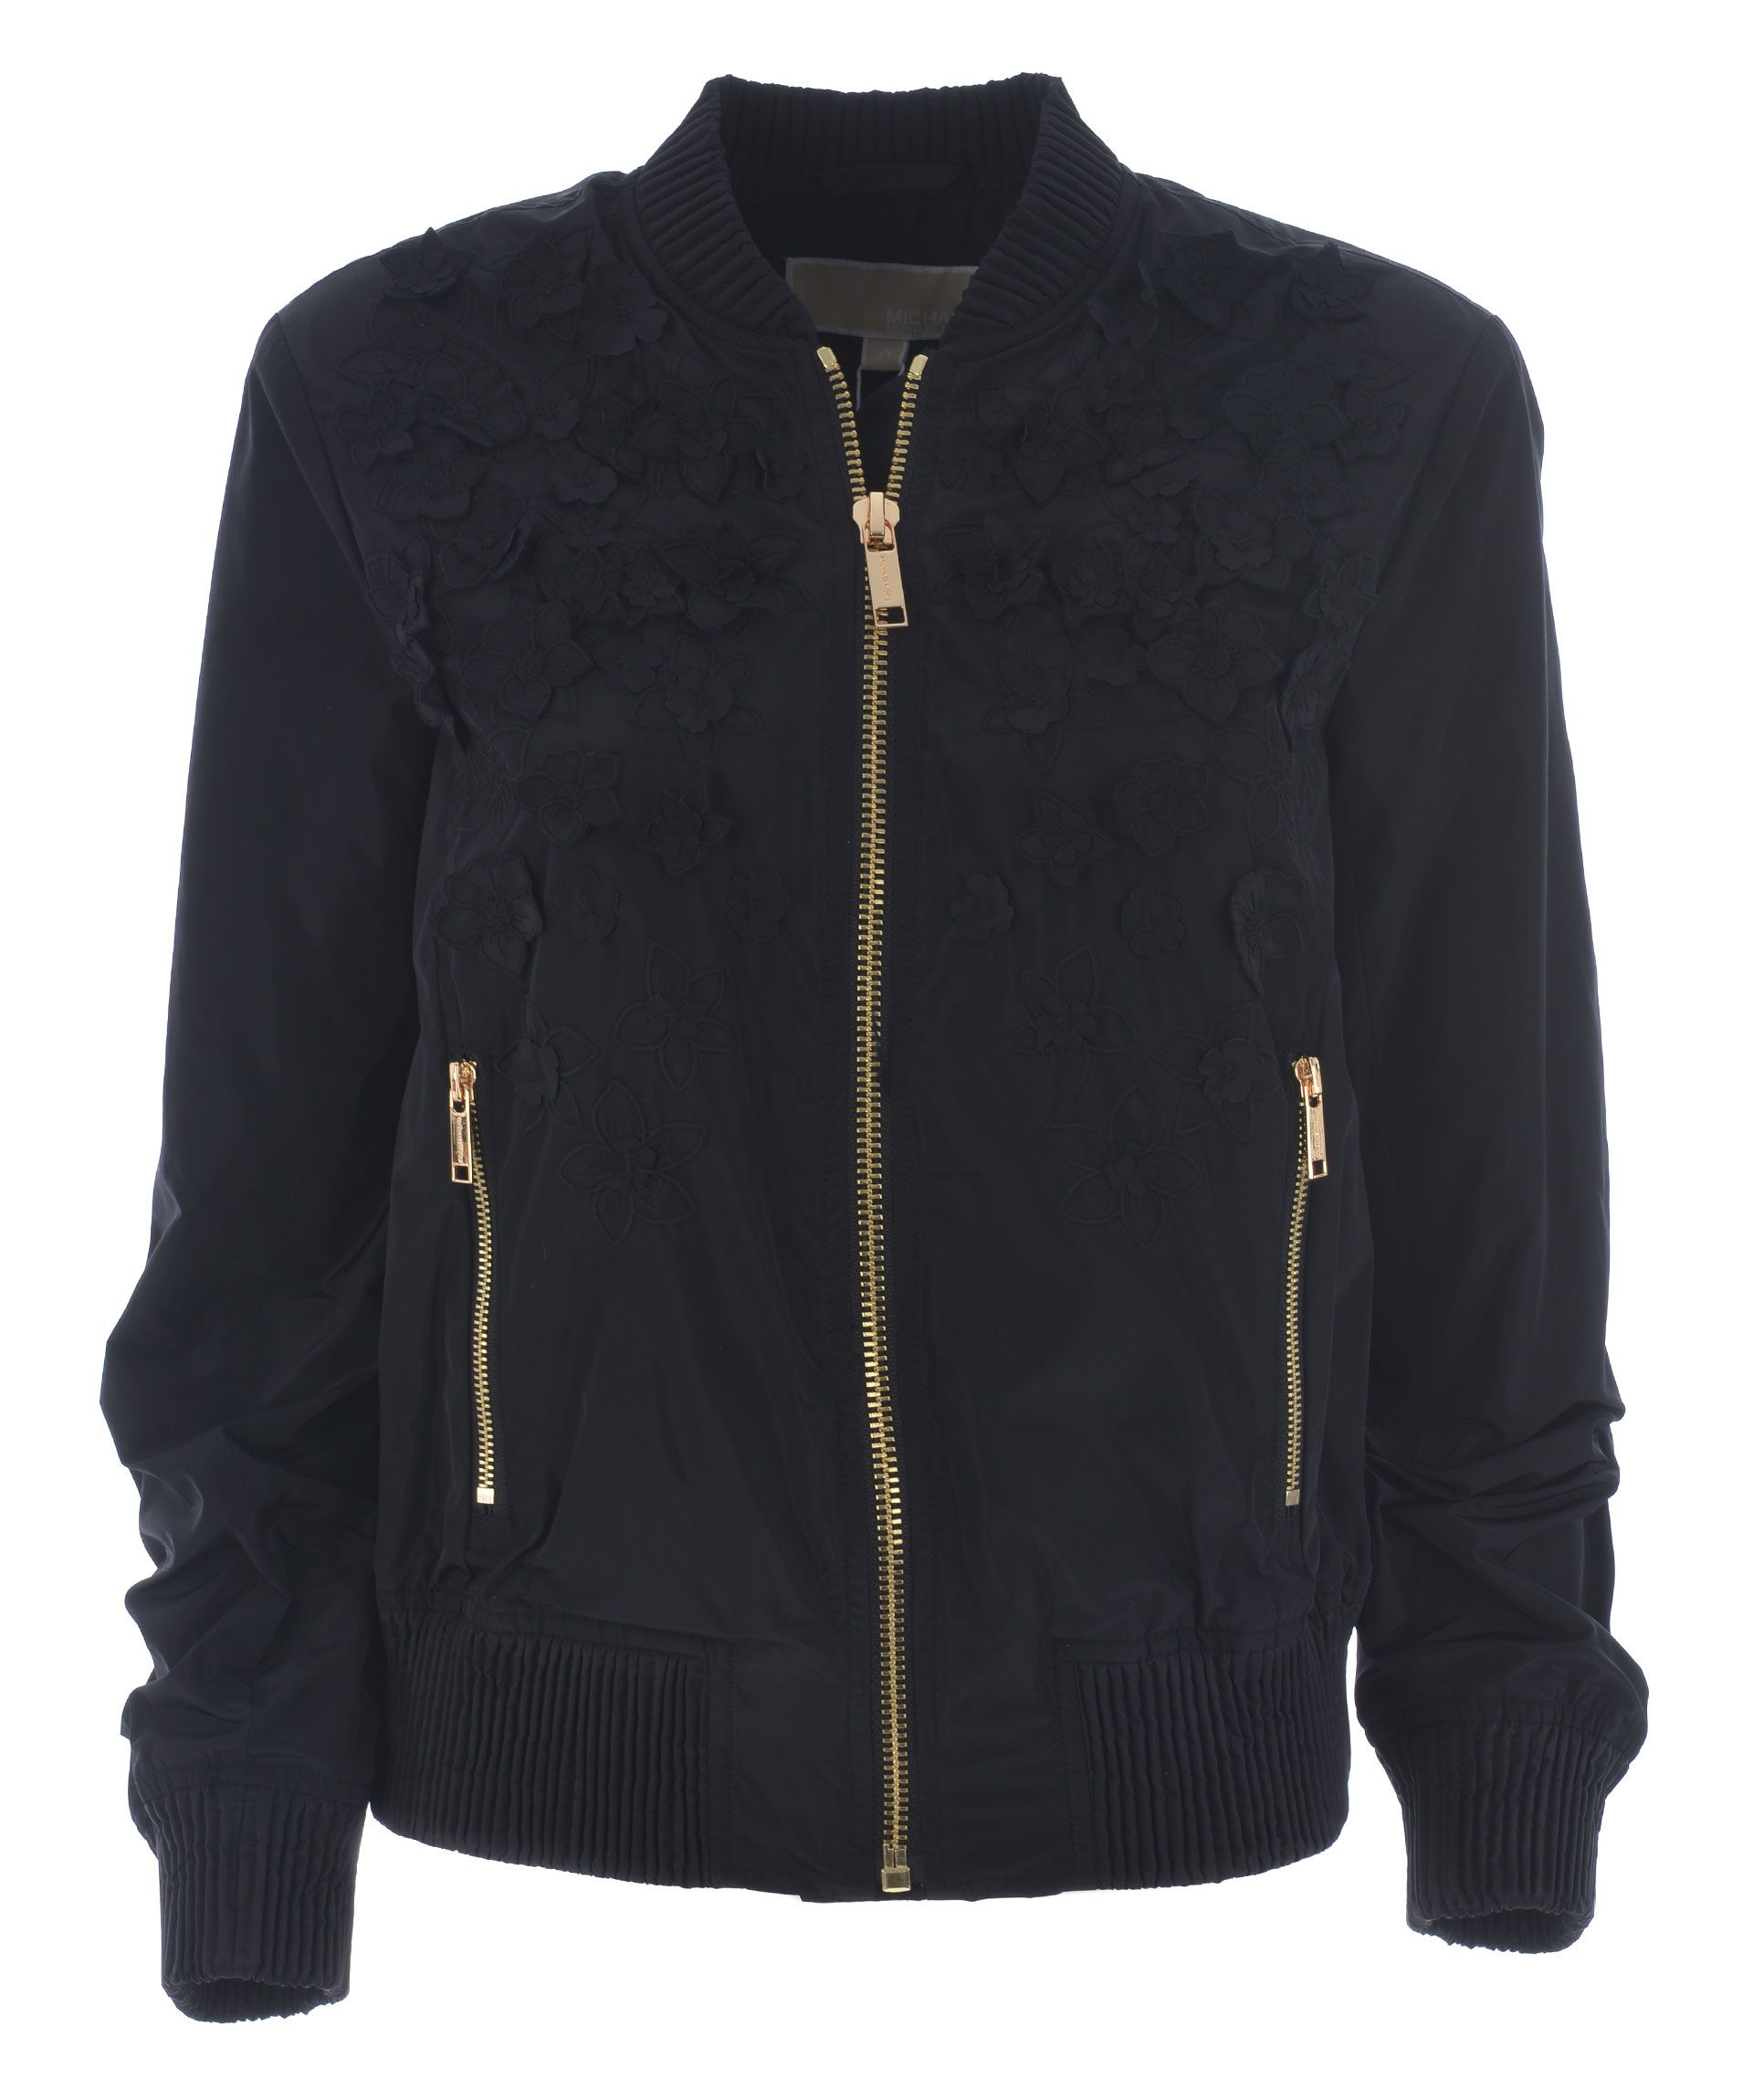 Michael Kors Embroidered Bomber Jacket